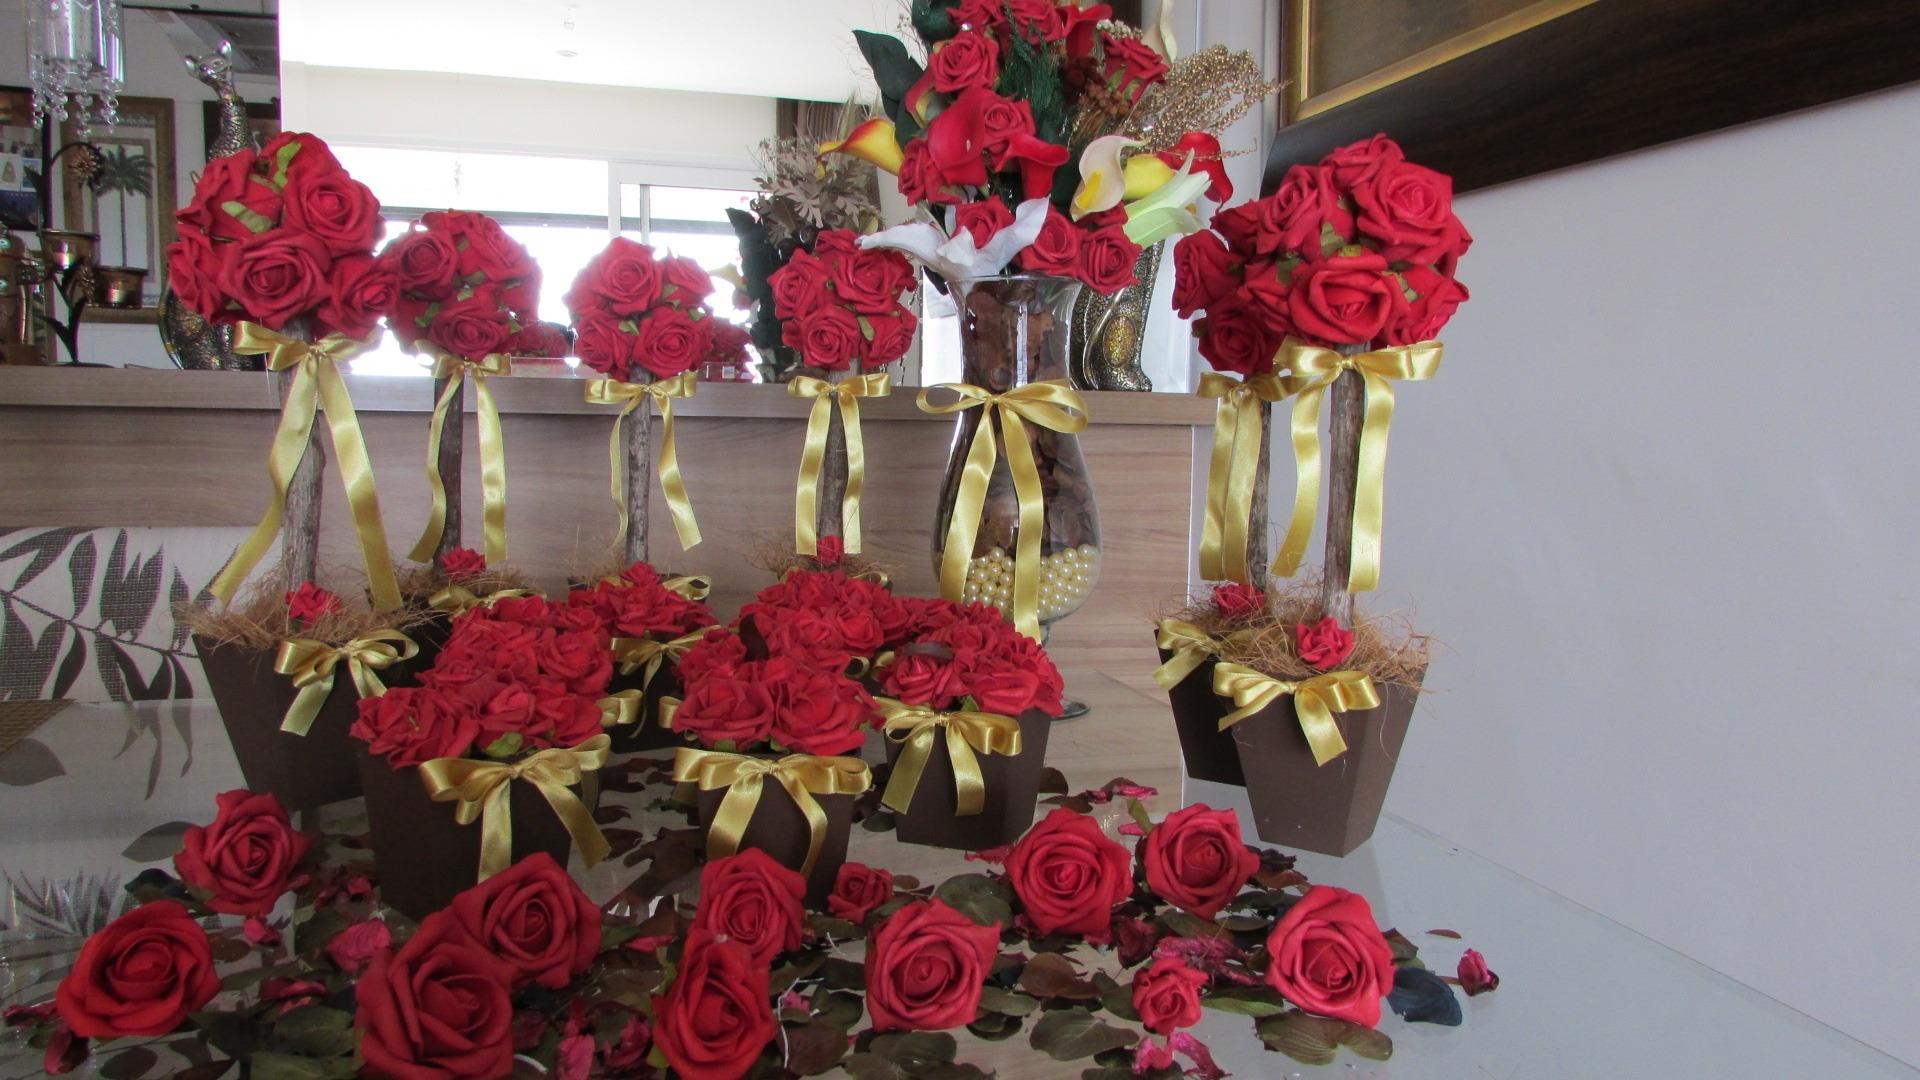 kit decoracao casamento:kit-sonho-di-vittoria-doudado-ii-topiara kit-sonho-di-vittoria-doudado